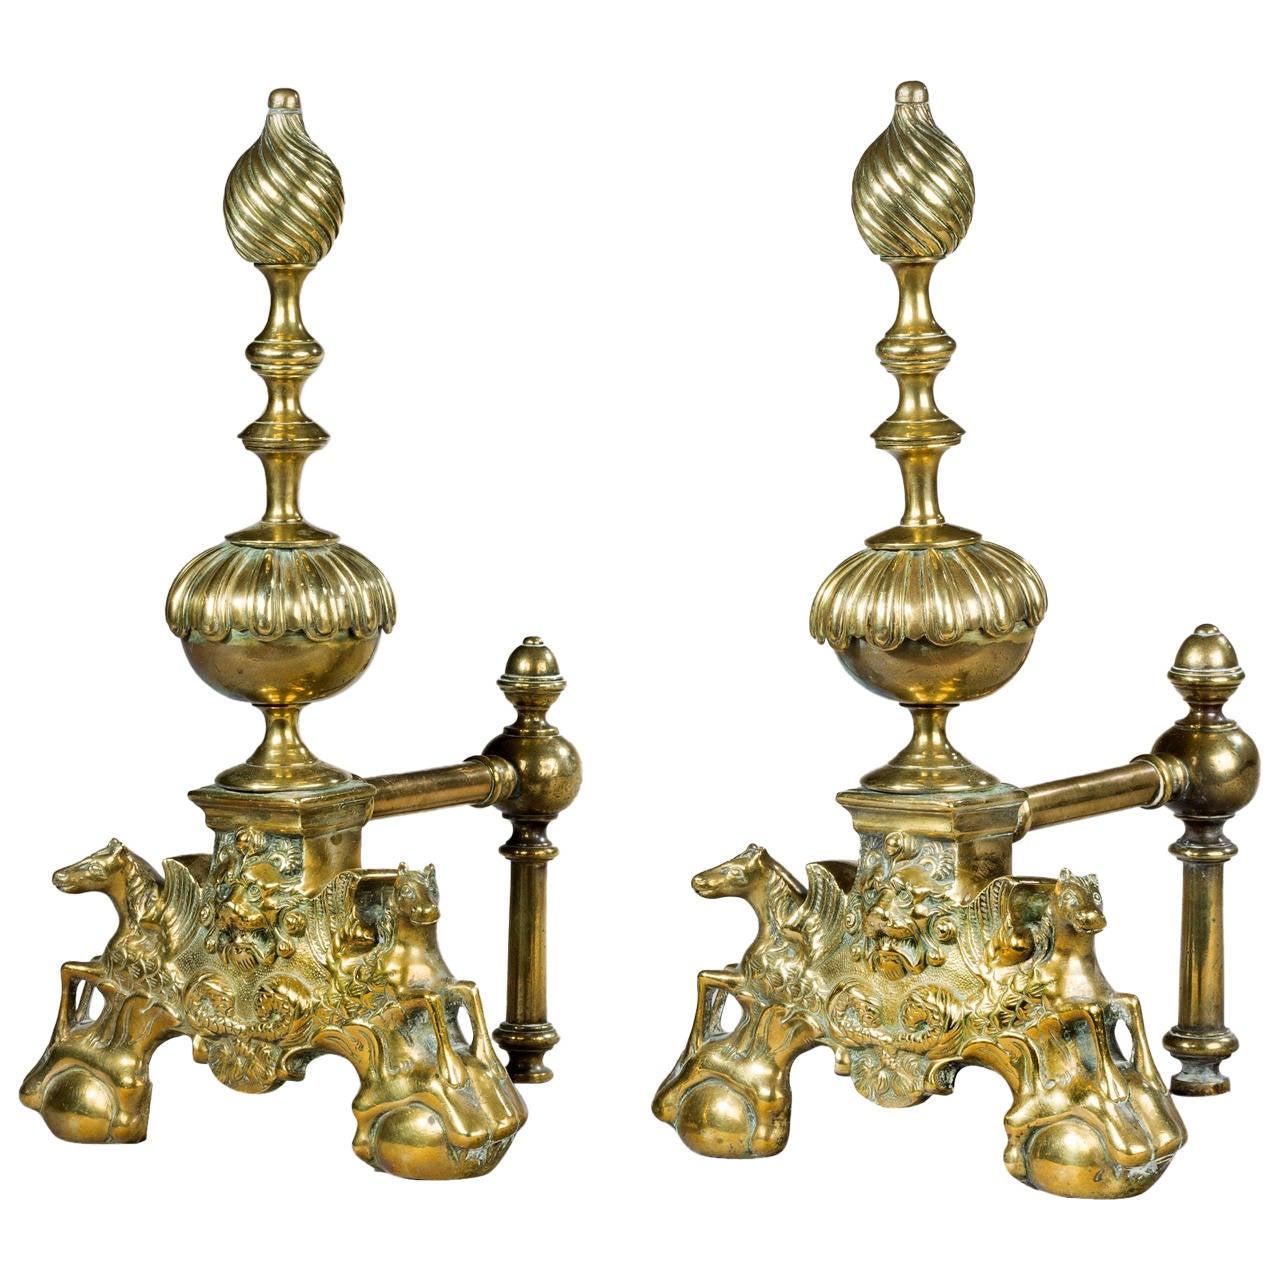 Pair of 19th Century Brass Andirons